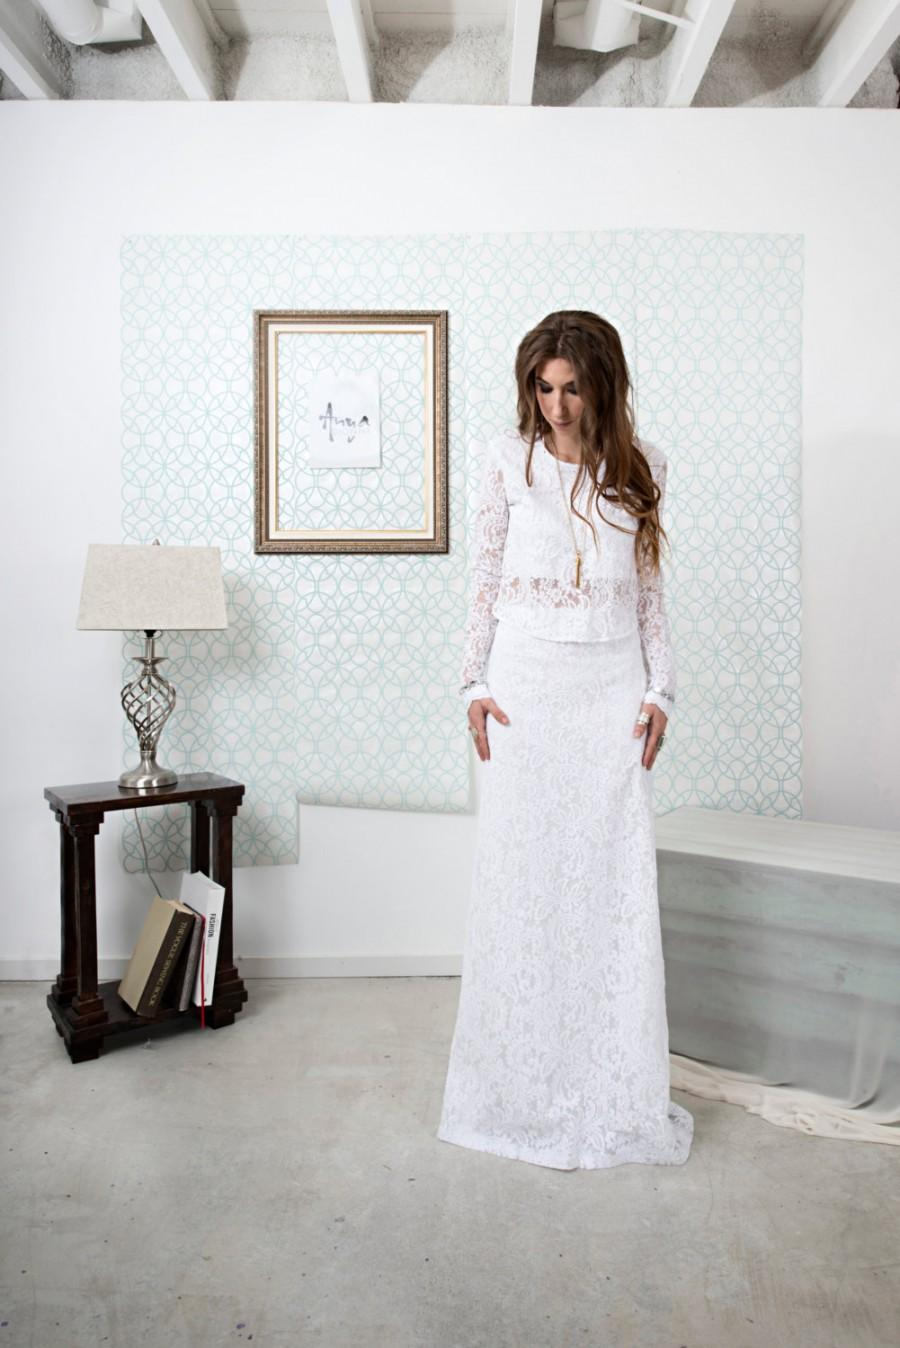 Wedding - Allirea / Lace Boho Wedding Dress Featuring a Long Sleeve with Gemstone Details